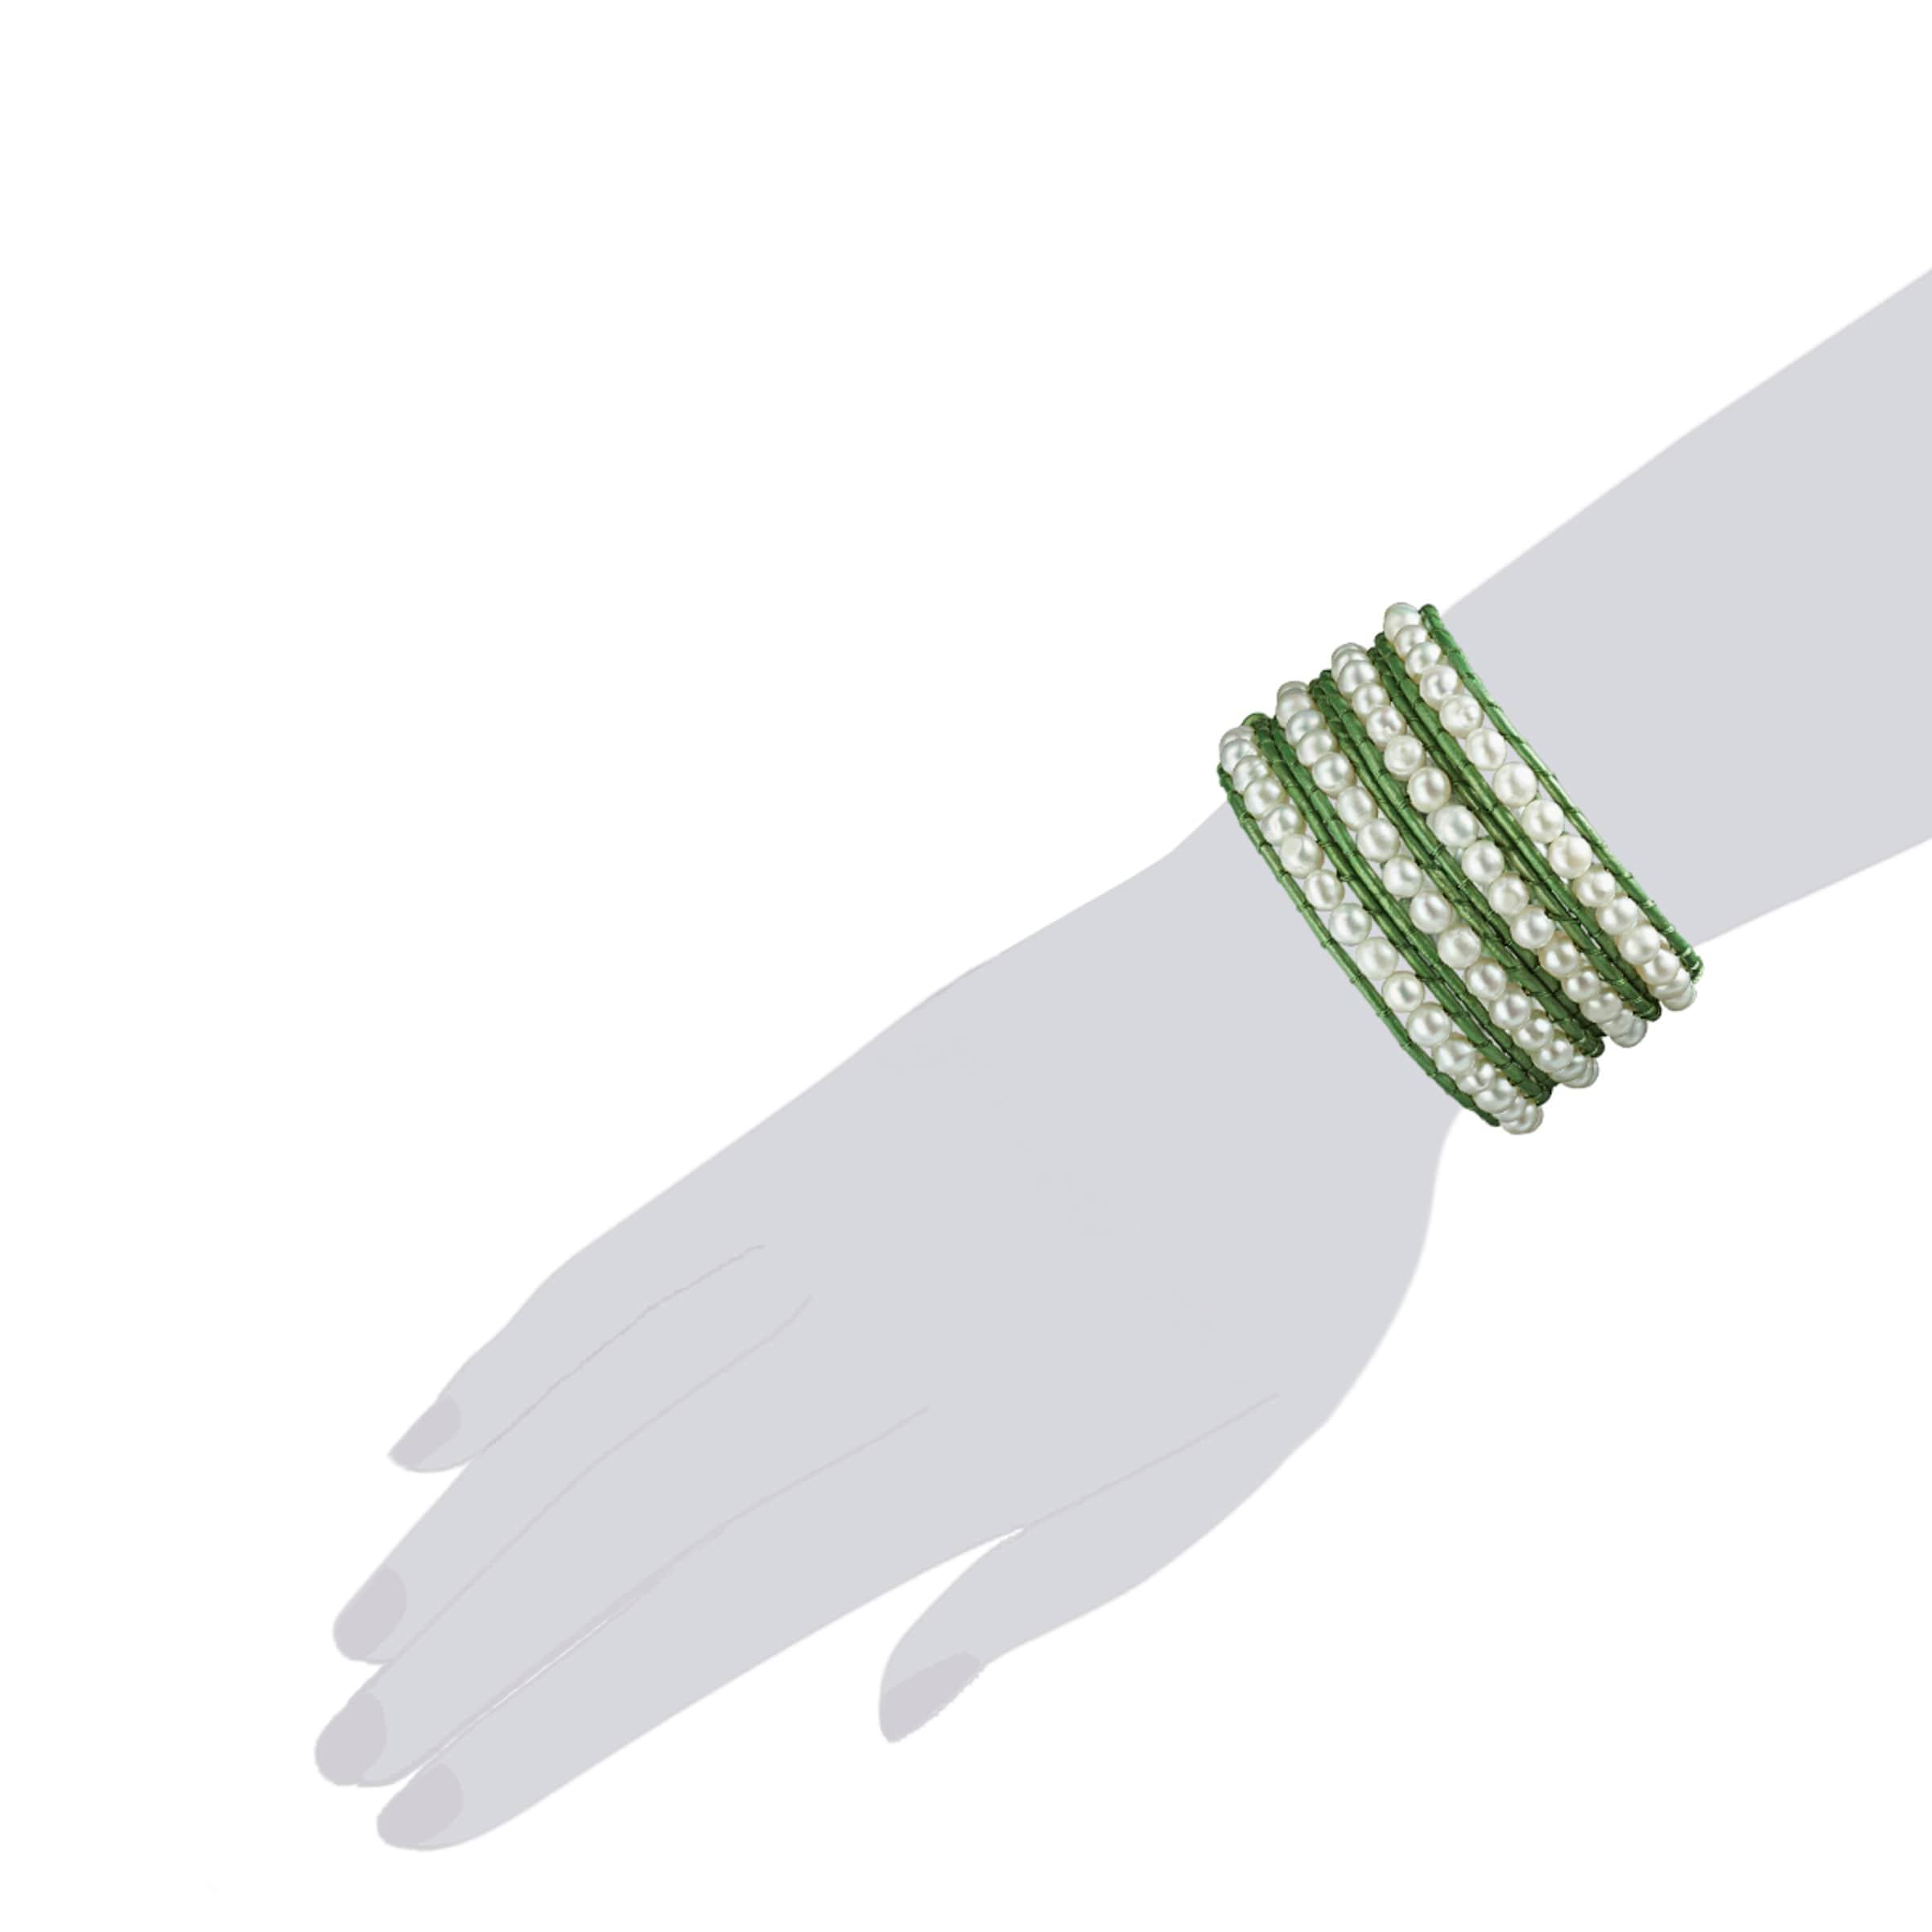 Valero Pearls Armband 2018 Neue Online 5cdfMNb9d8